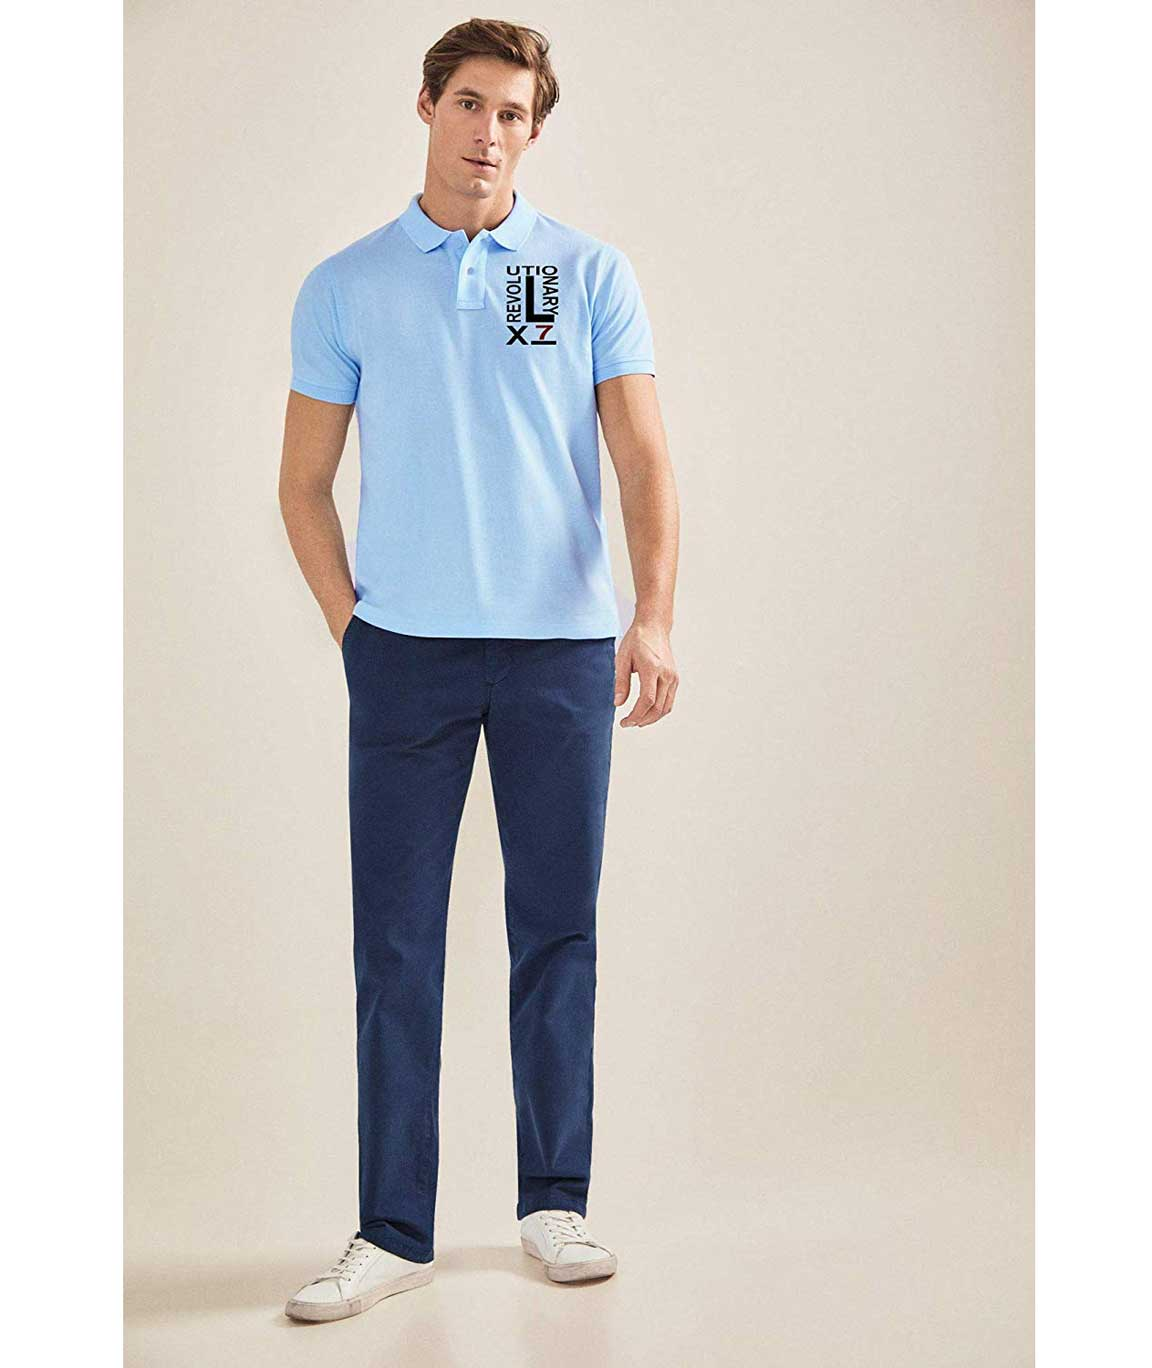 Vestiario Cotton Printed Polo Neck t-Shirt Combo of 2